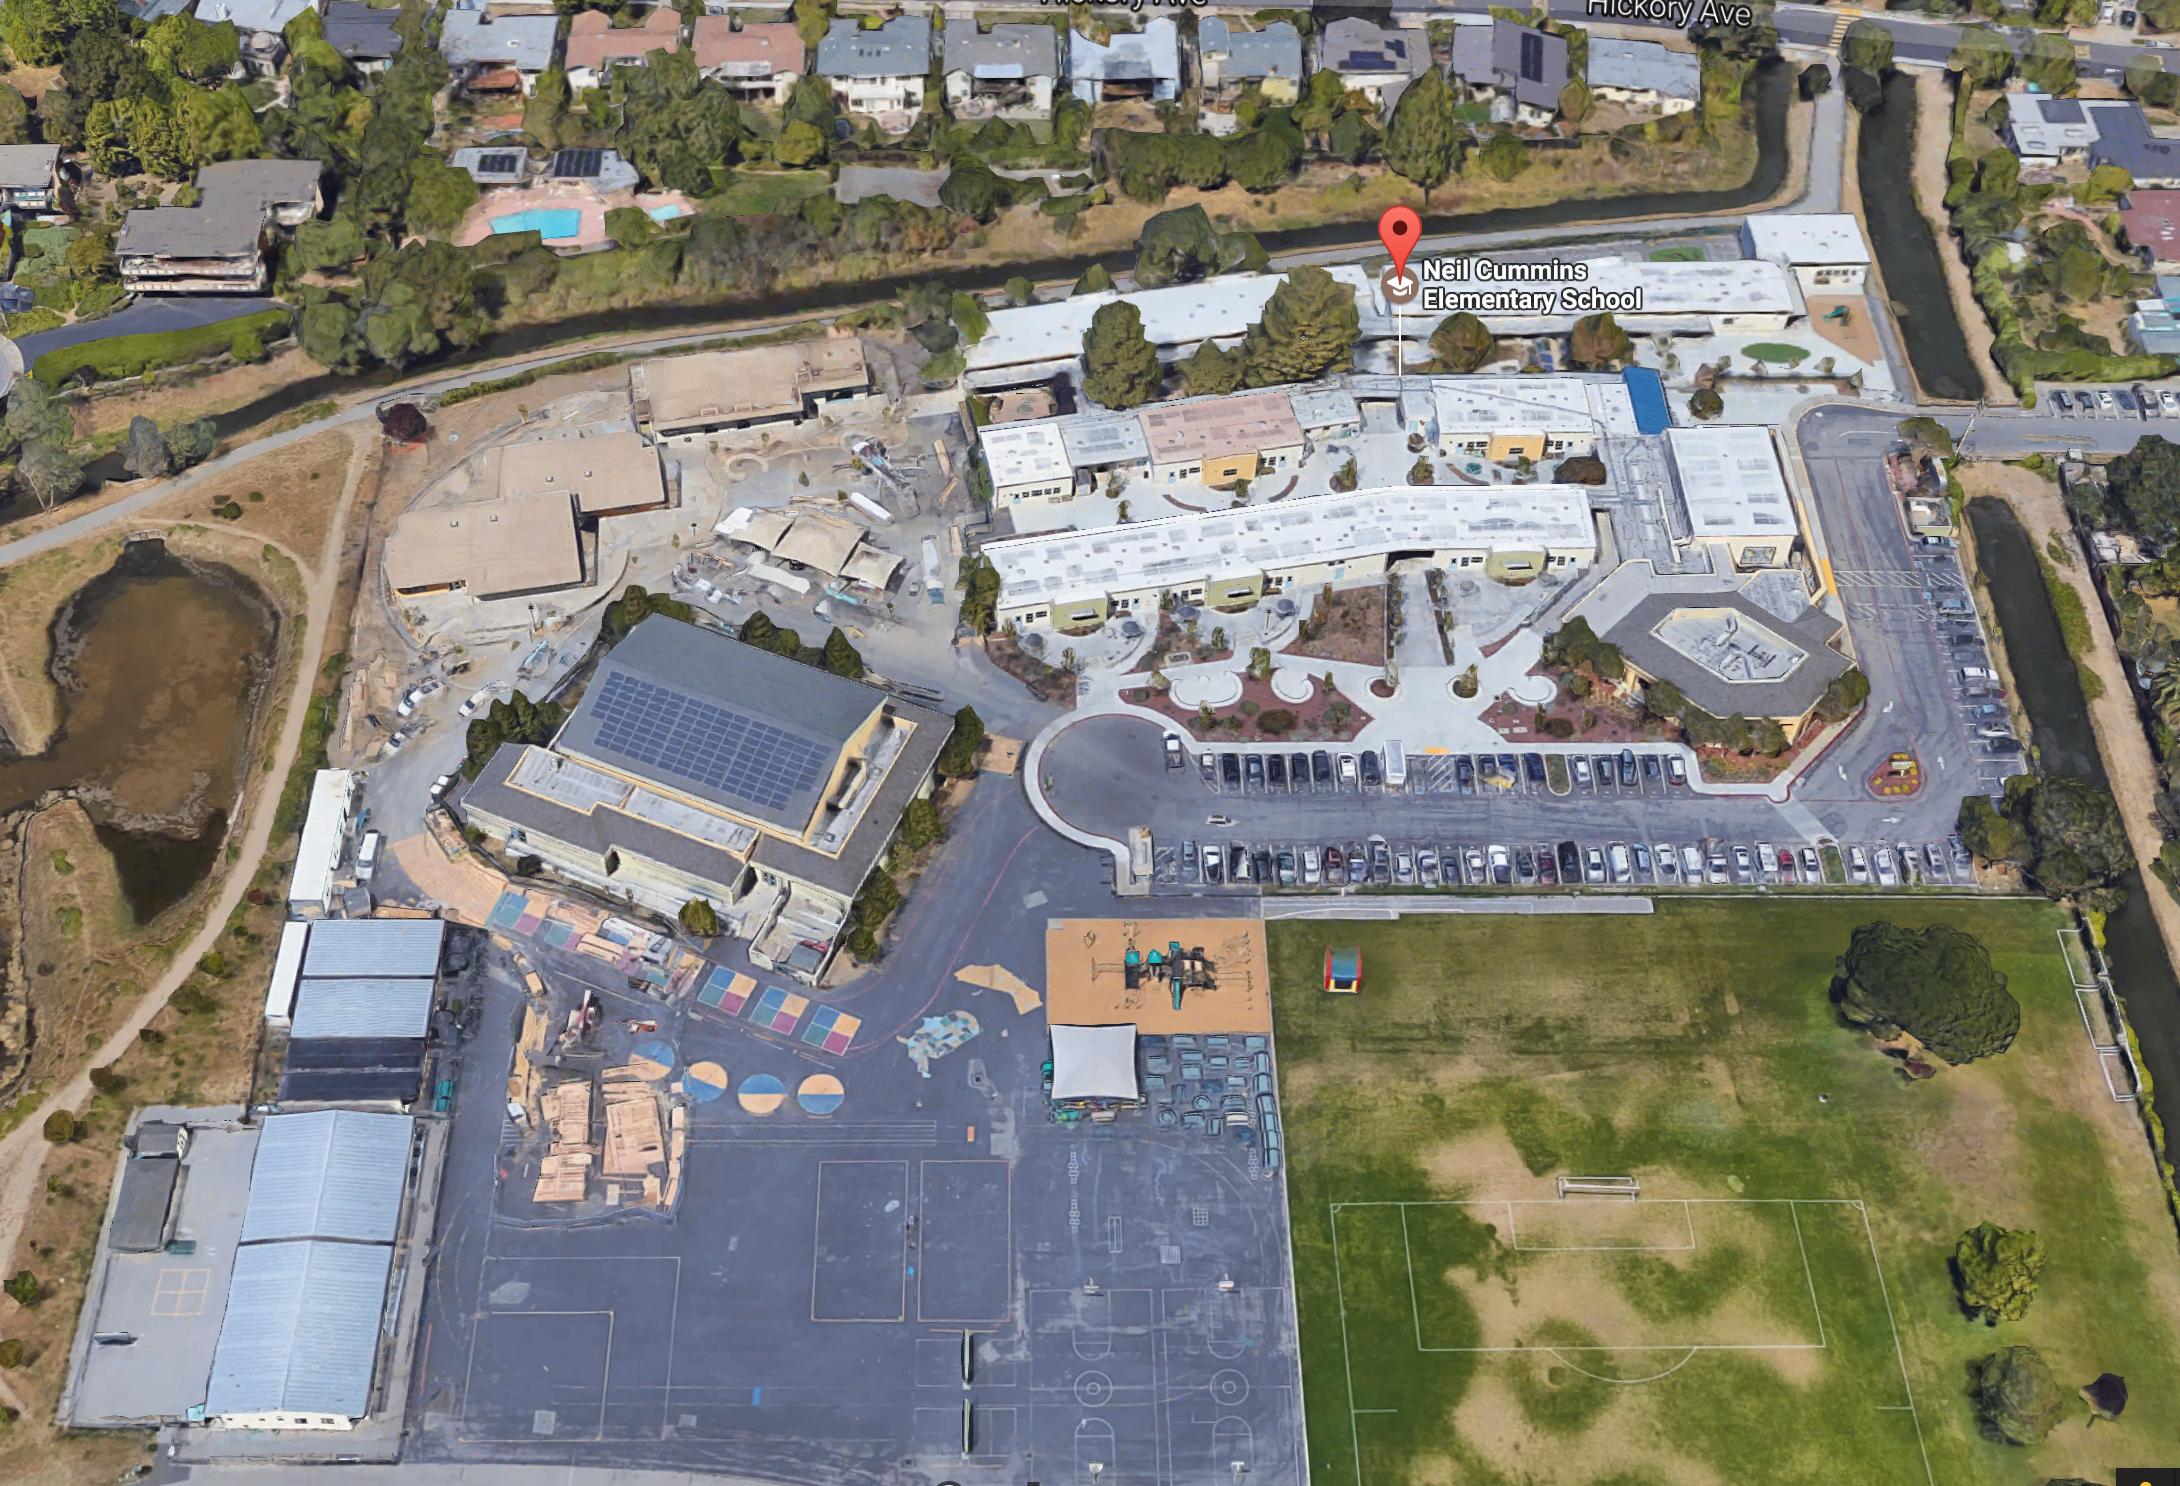 Neil Cummins Elementary School Rooftop Solar PV